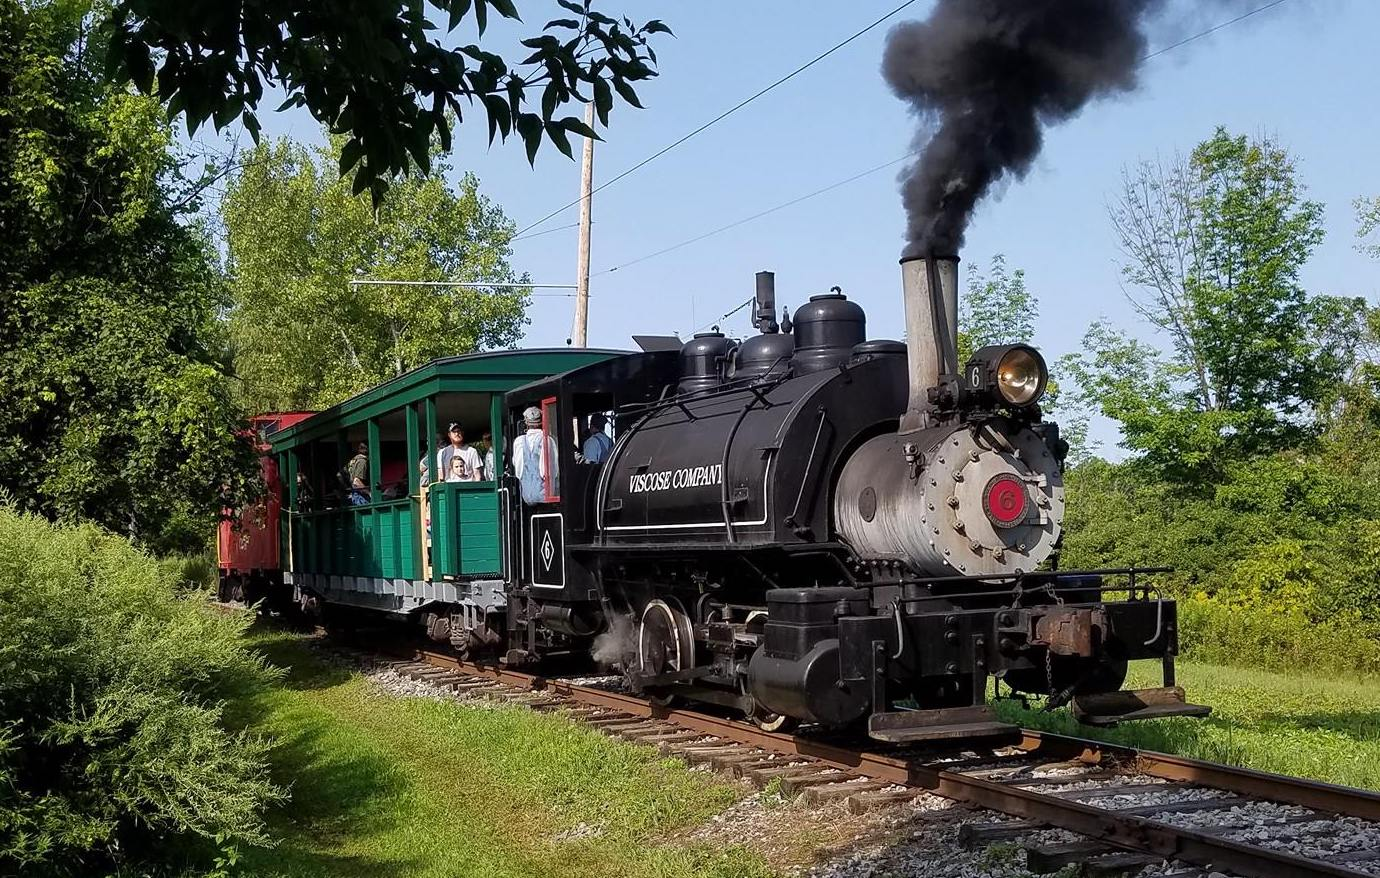 Viscose 6 Steam Train